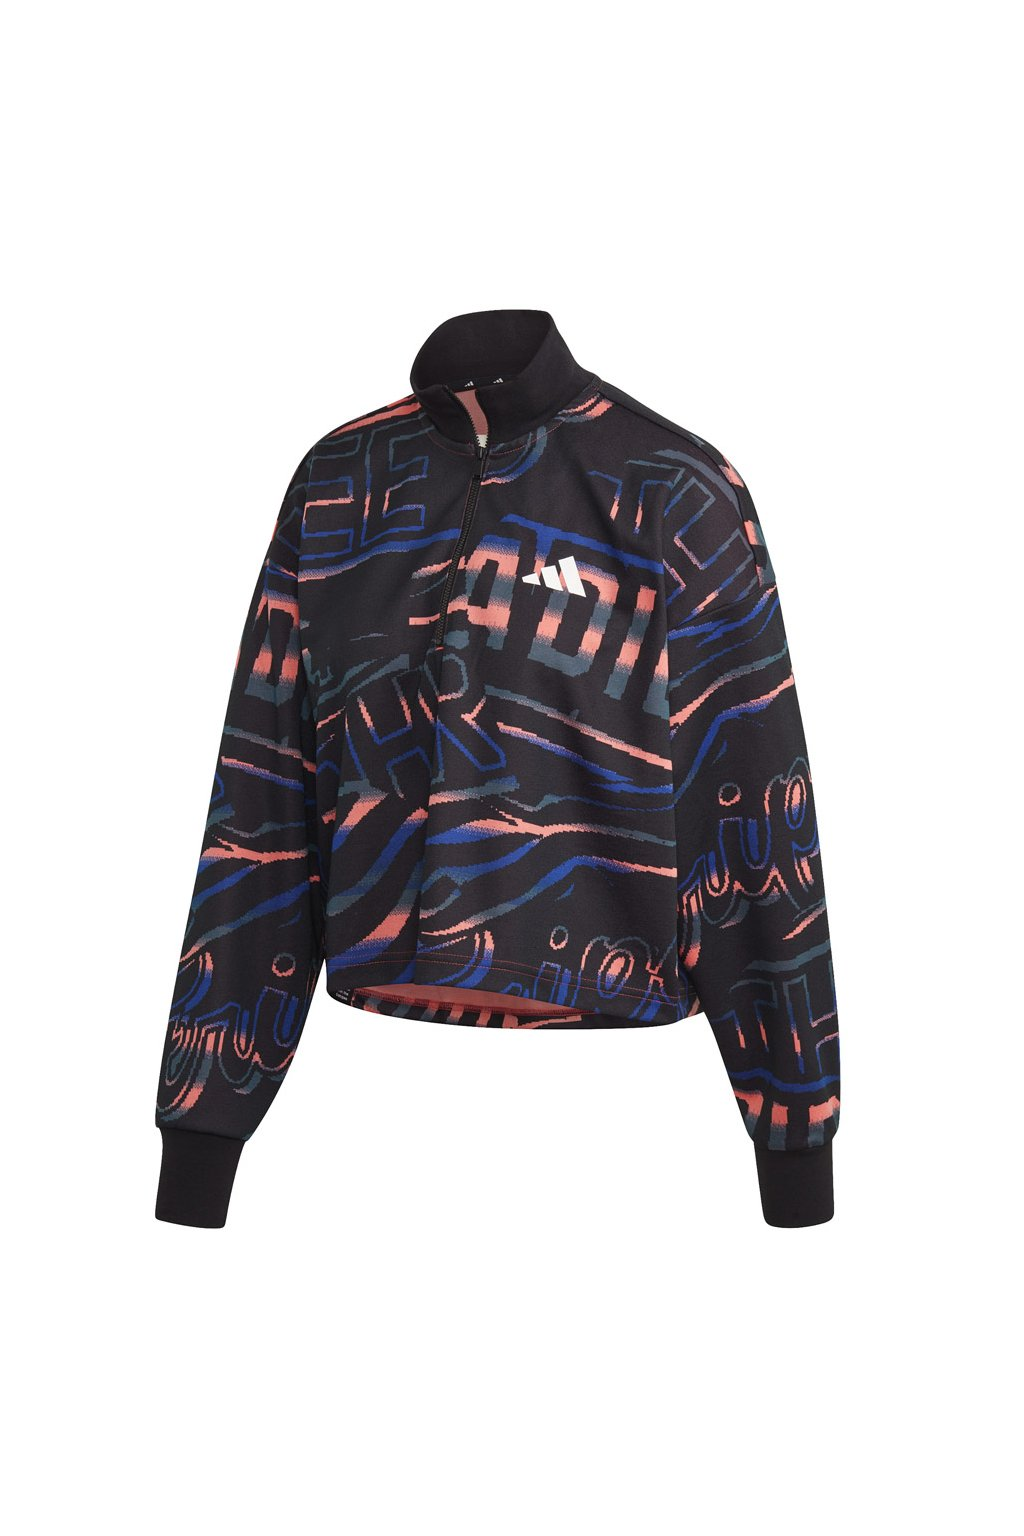 Dámska mikina Adidas W Ur Halfzip čierno-modro-oranžová FT9731